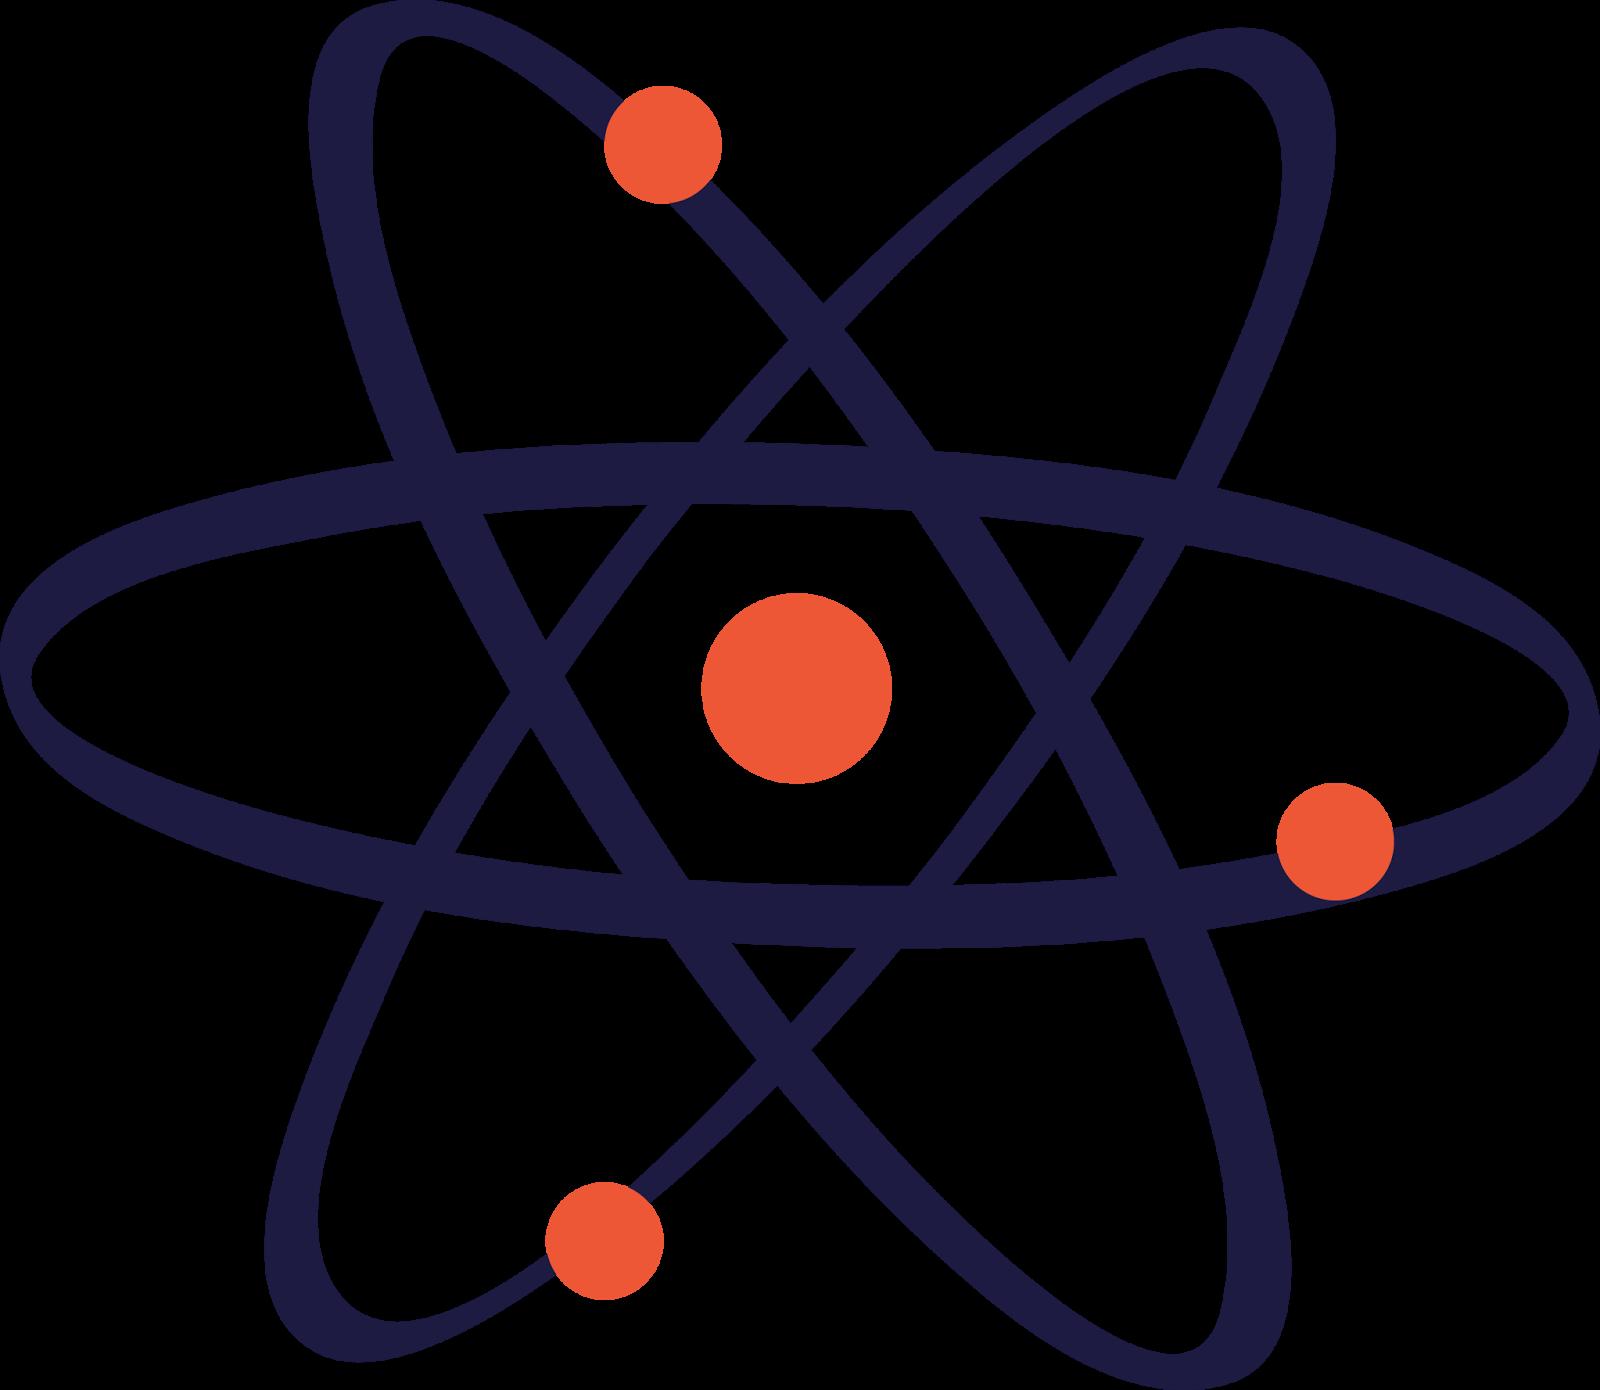 Atom clipart atomic model. Symbol clip art transprent